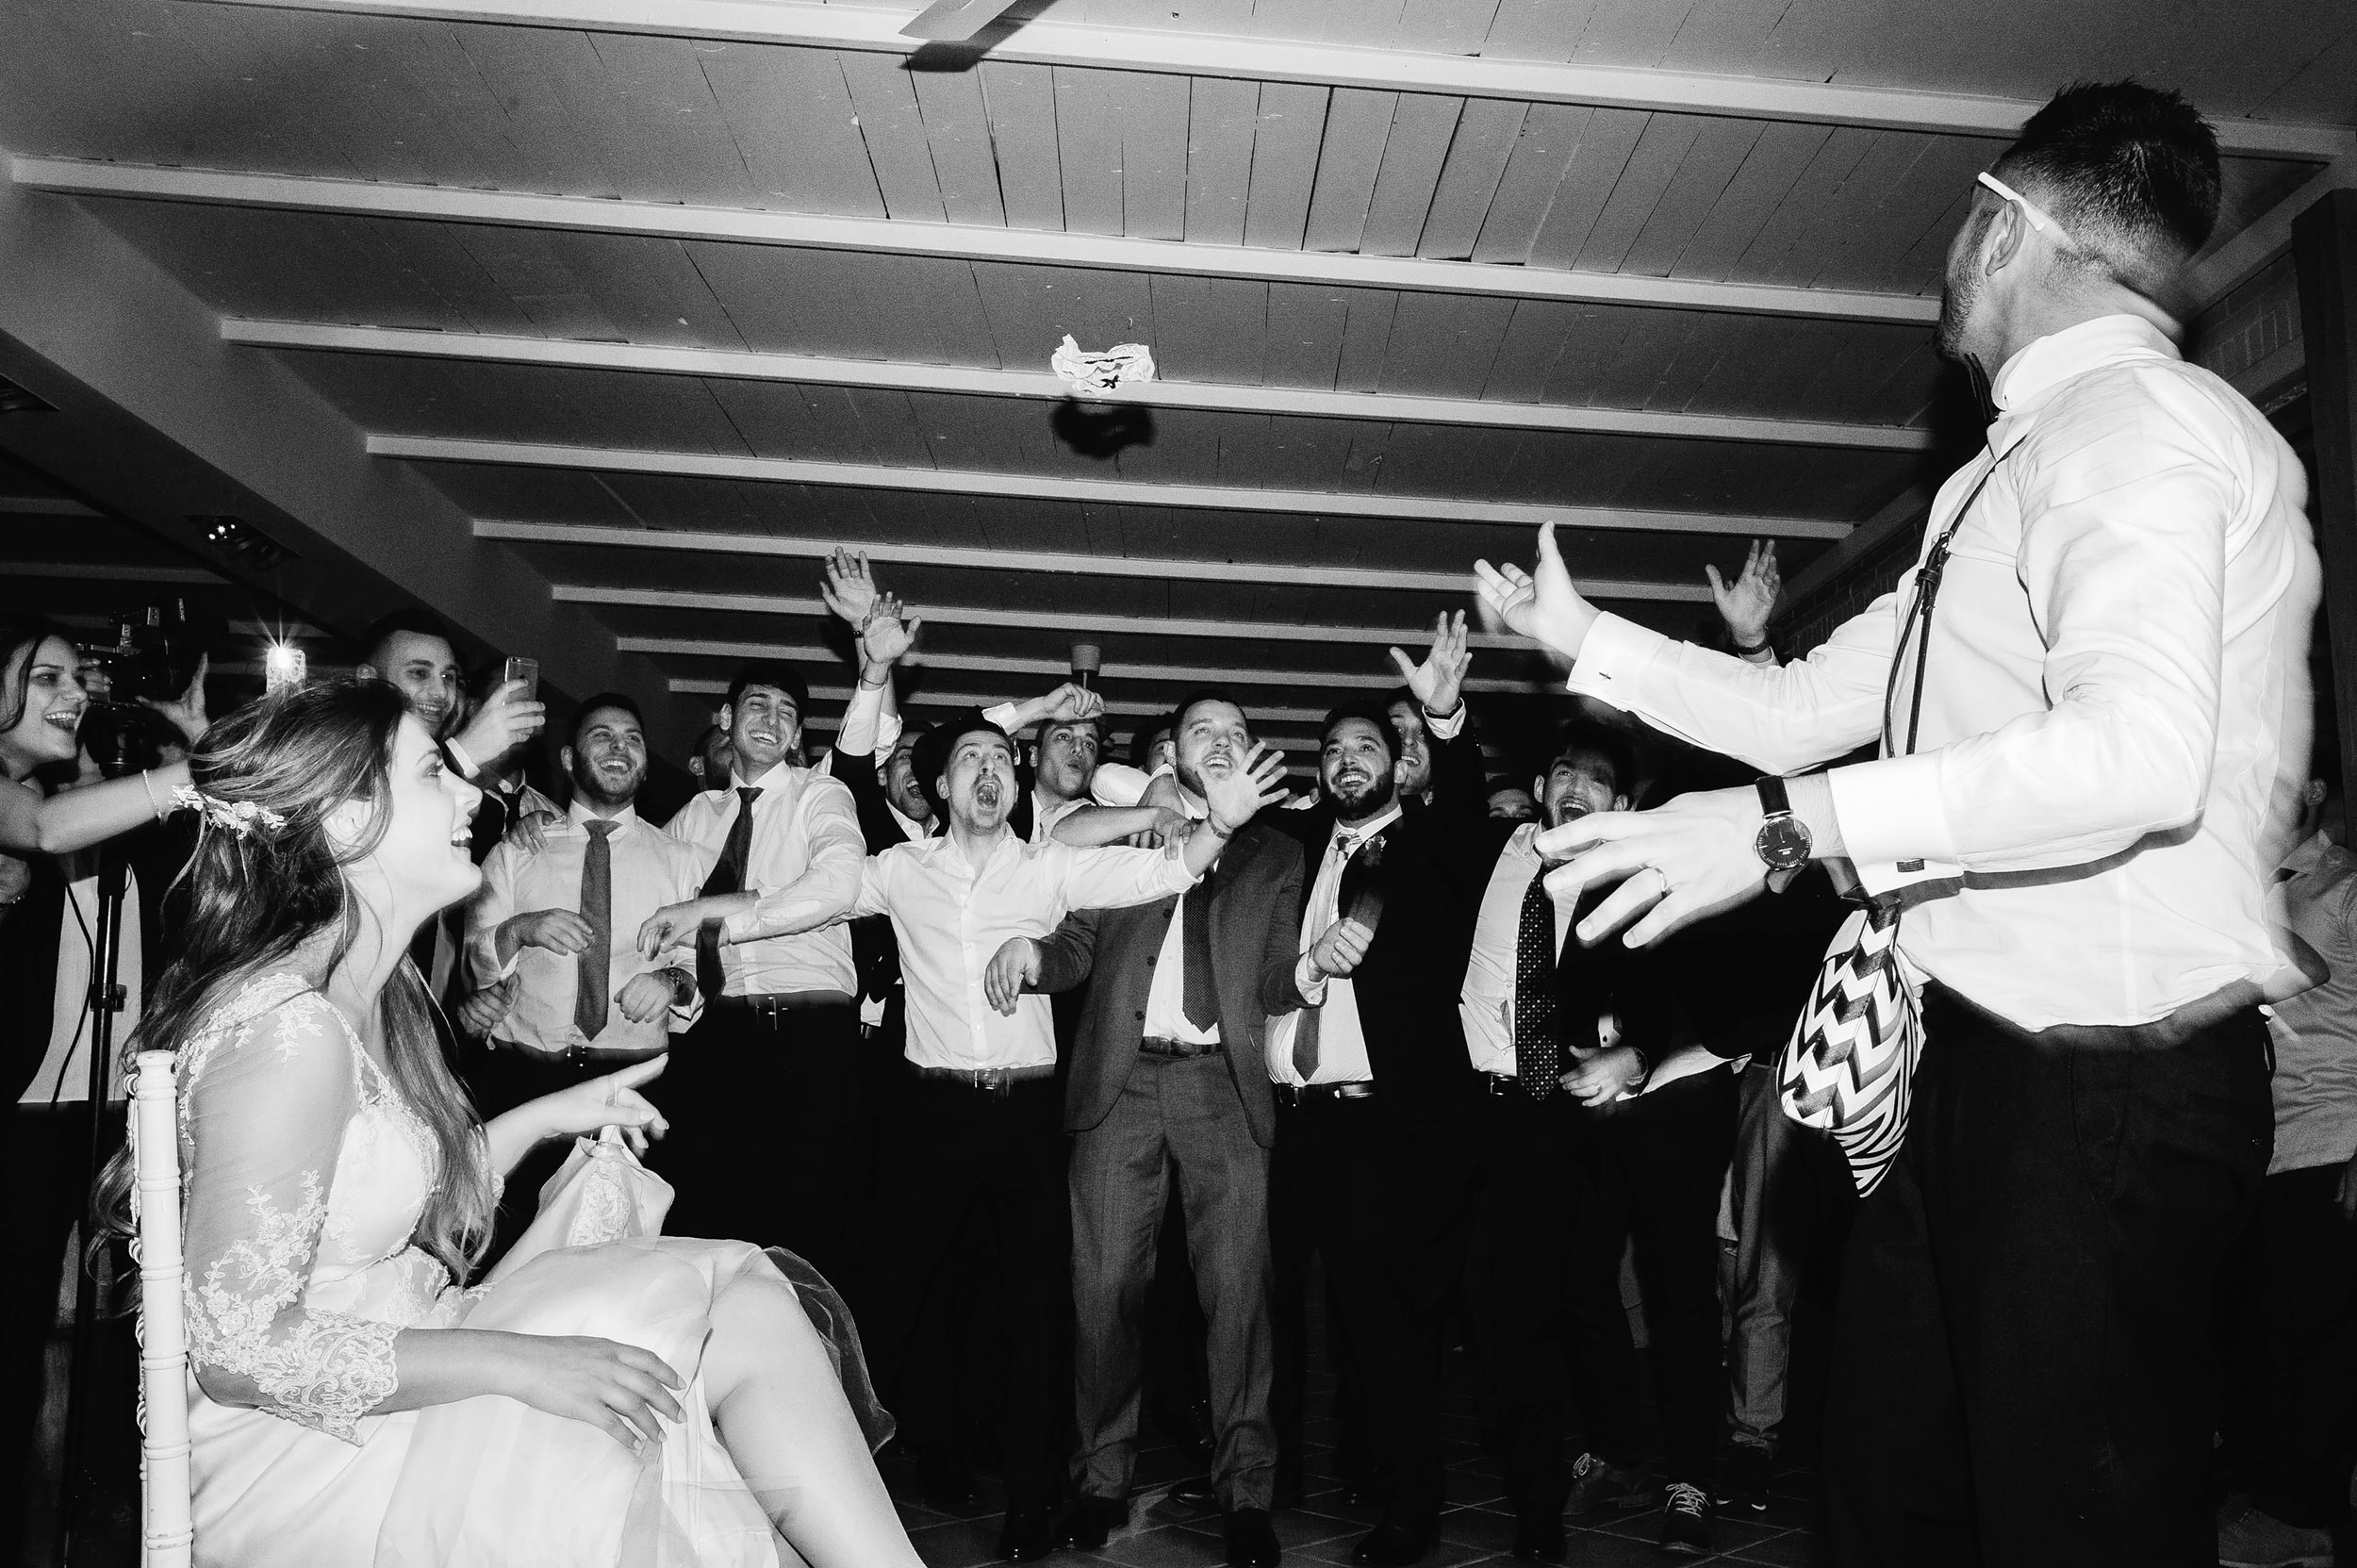 garter-wedding-reception-groom-italy-la_remessuola-documentary-wedding-photography-by-Alessandro-Avenali.jpg